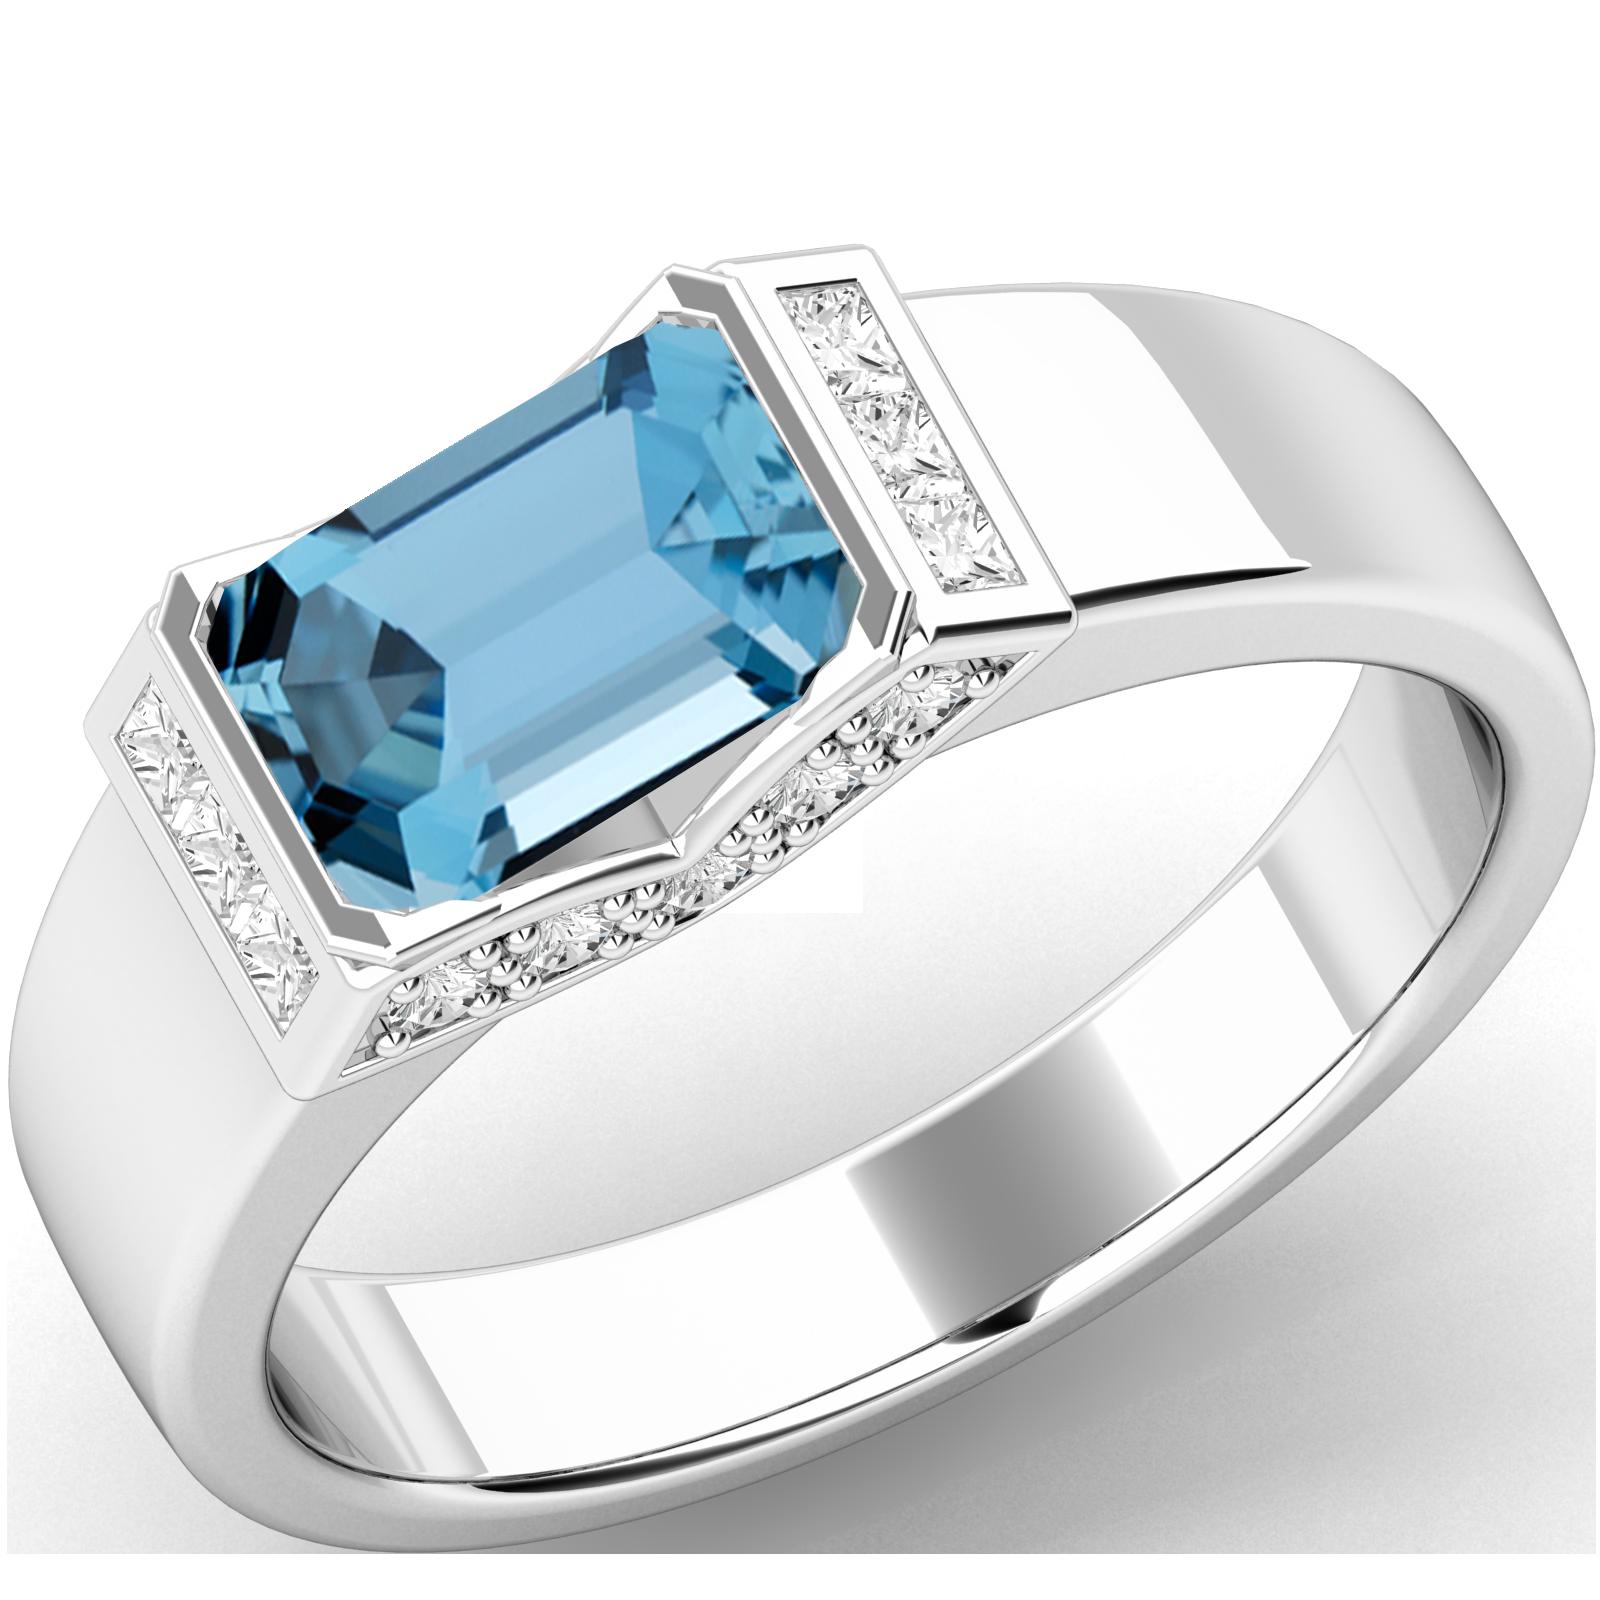 Inel Dama Aur Alb 18kt cu Acvamarin si Diamante-img1